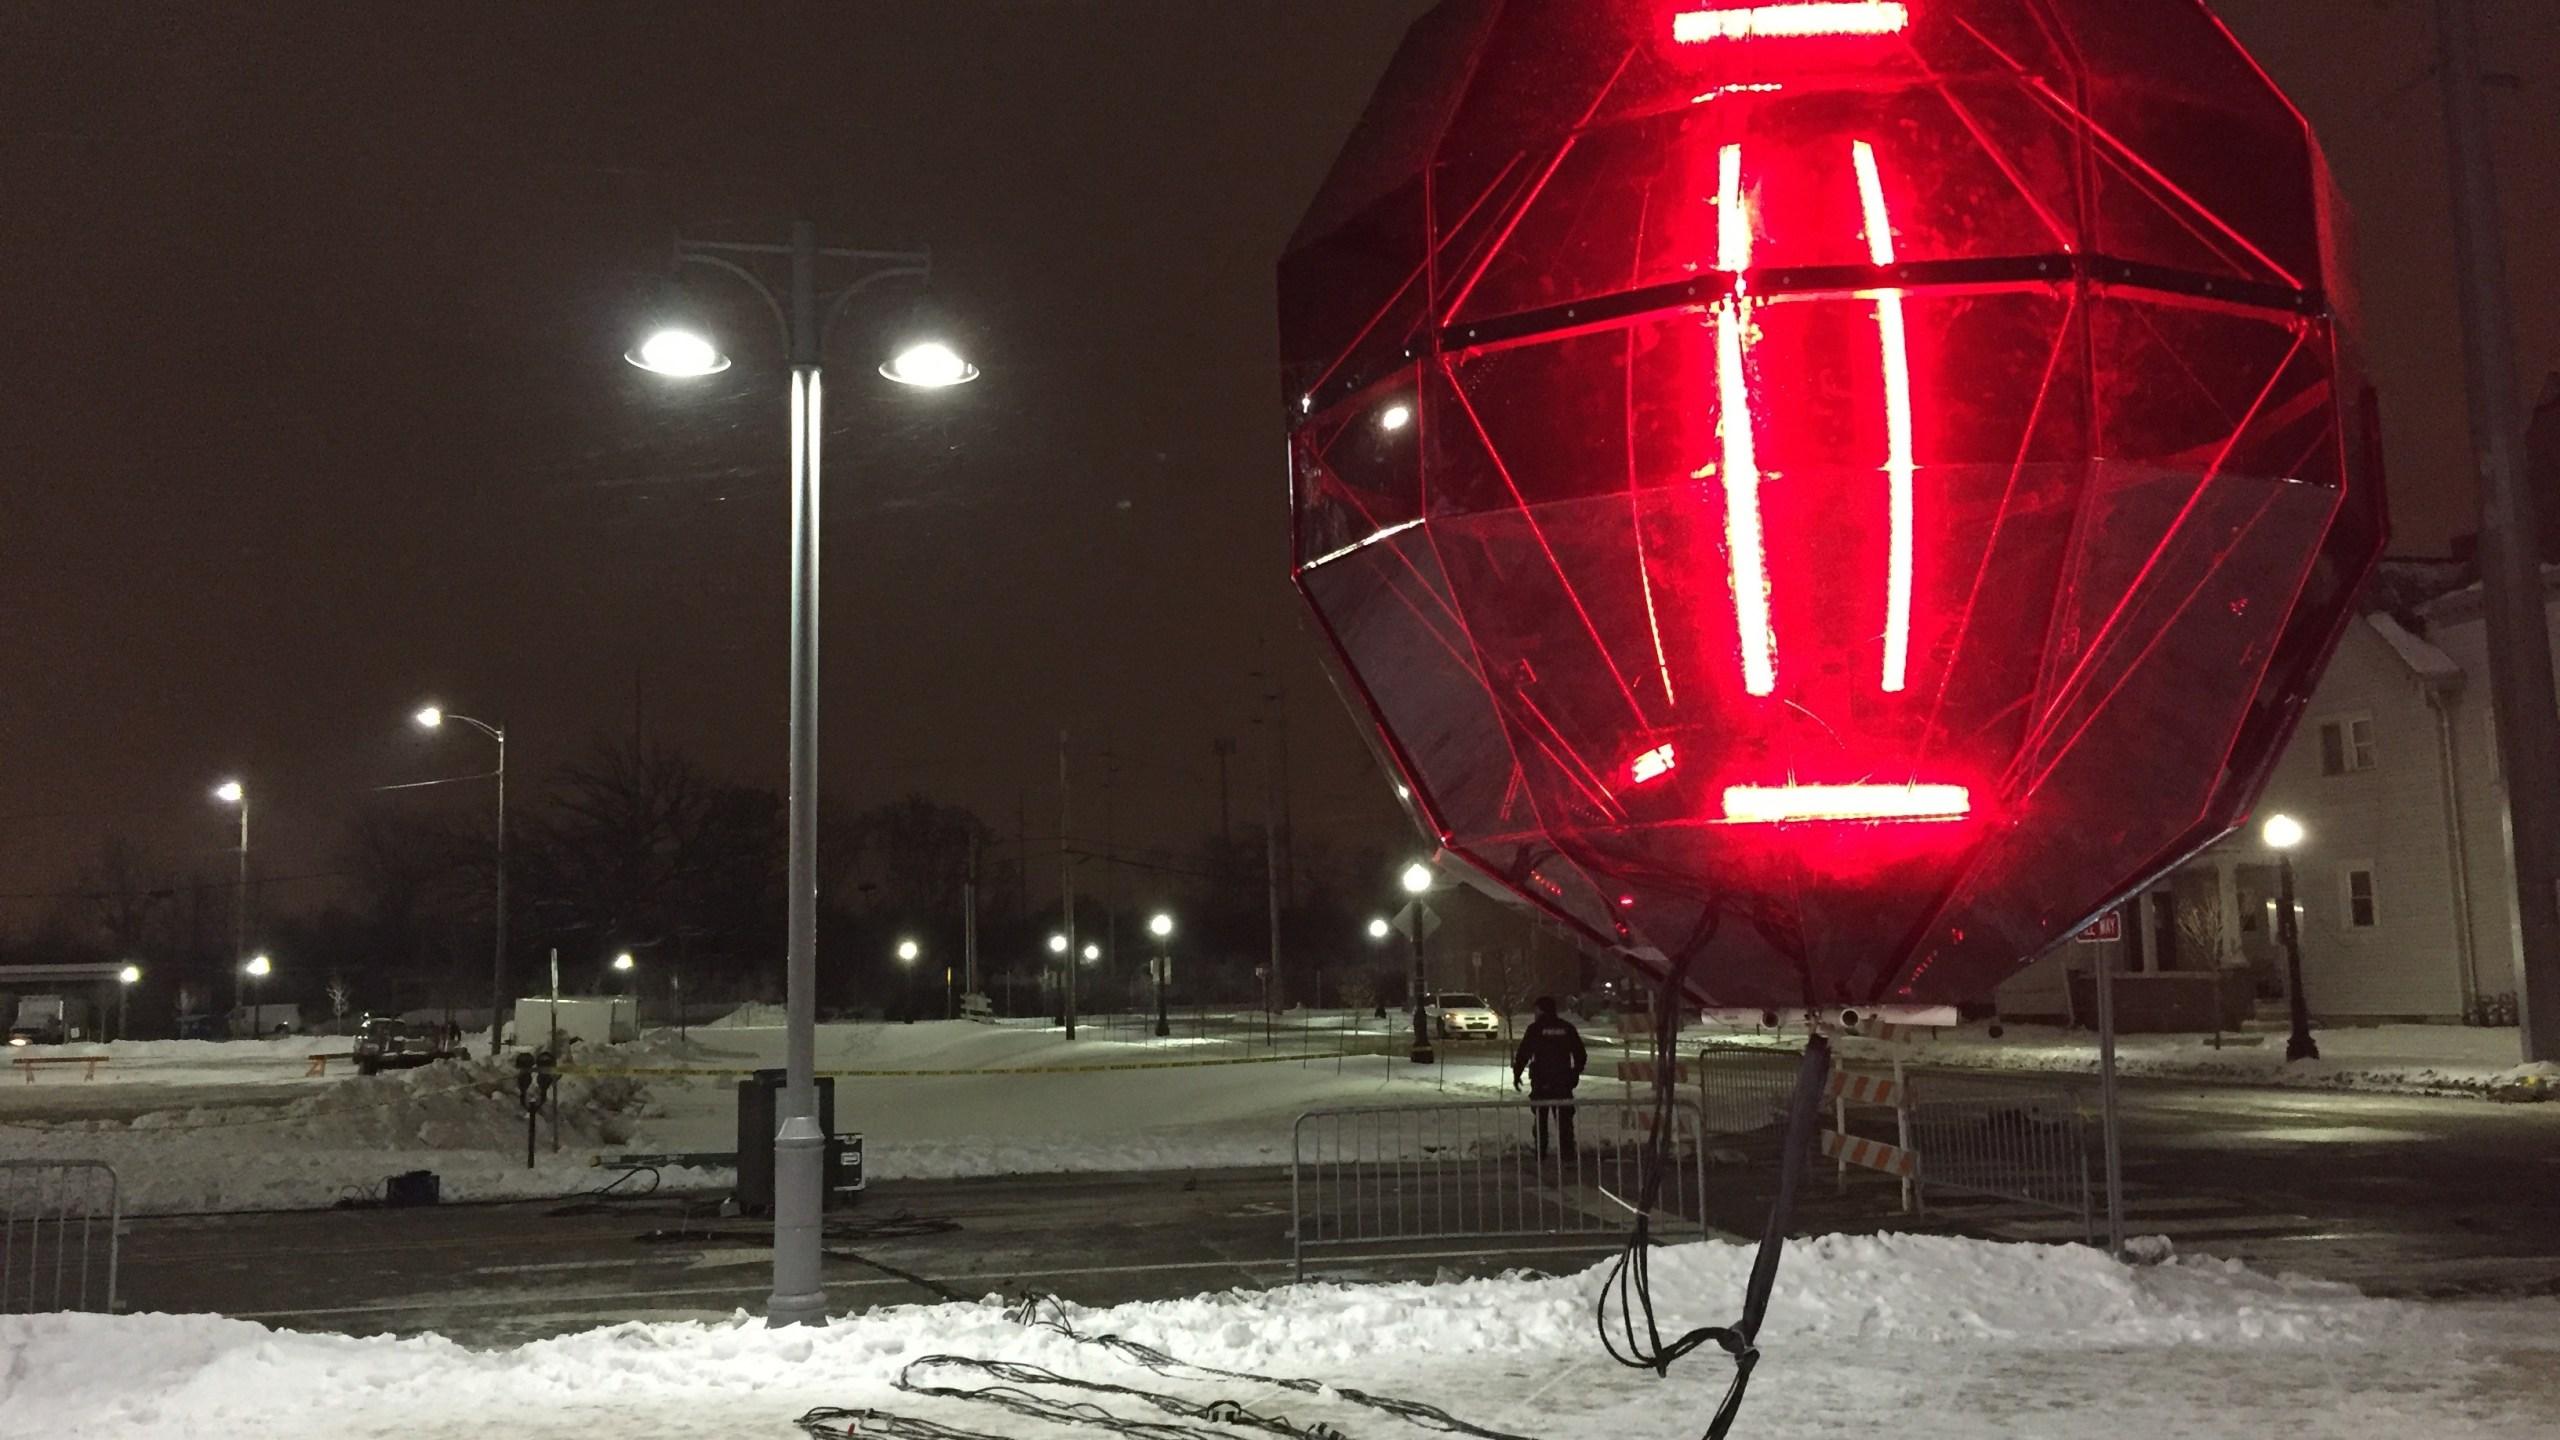 Ball Drop New Year's Fort Wayne 2018_304799